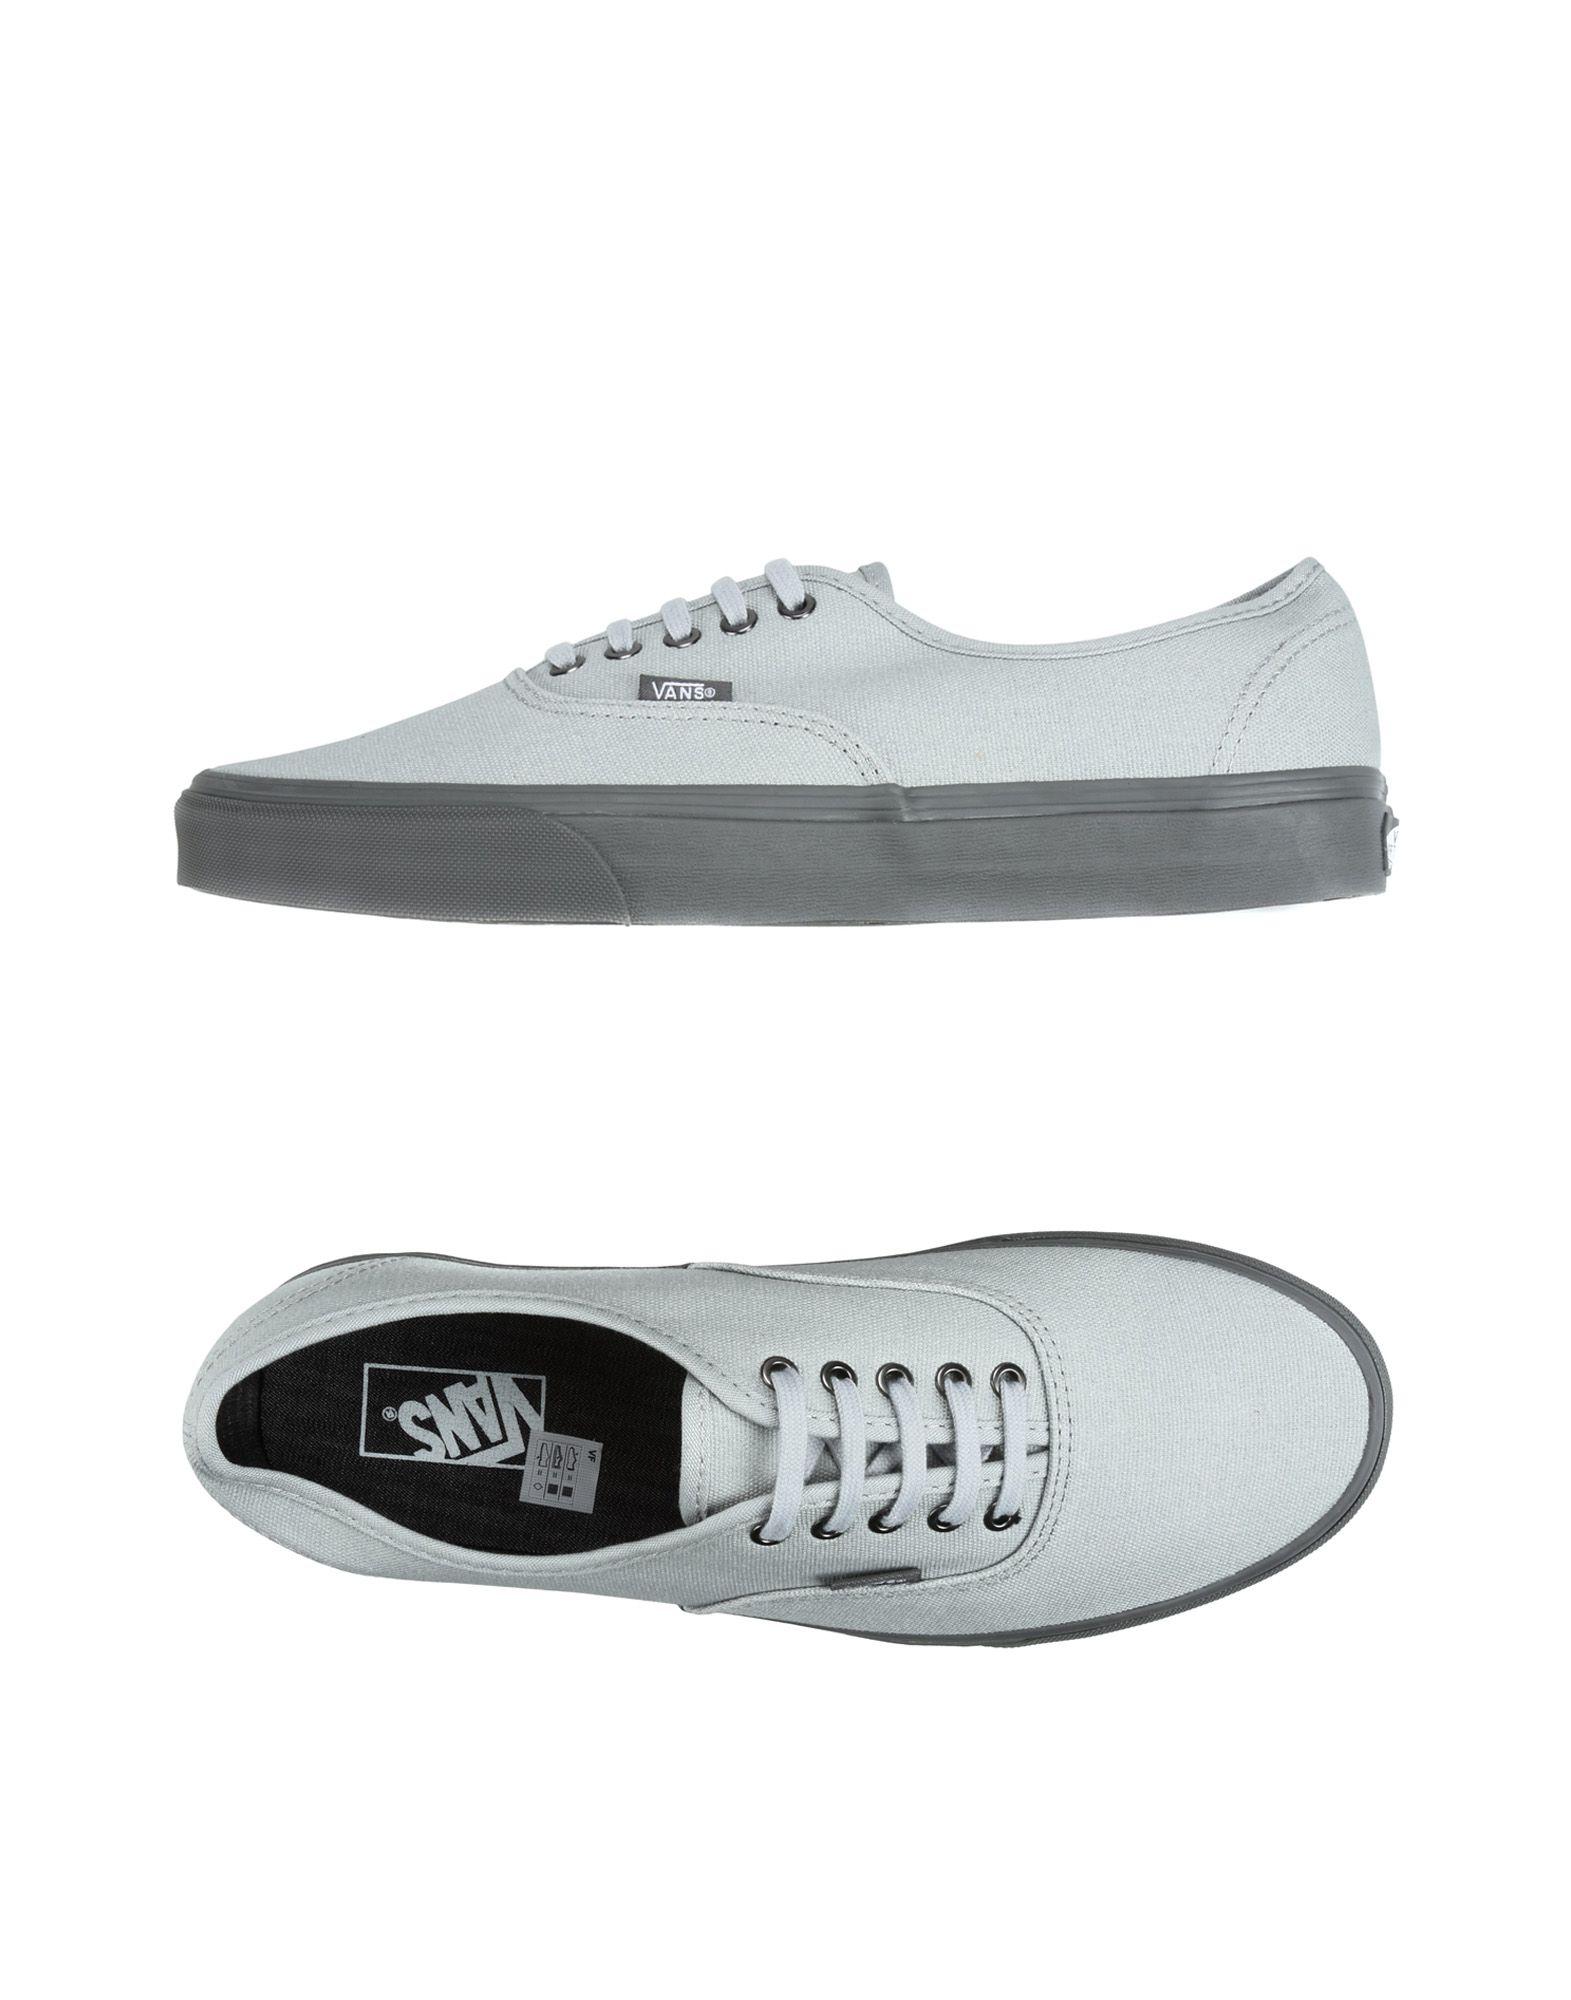 Vans Ua Authentic - C&D Vans - Sneakers - Men Vans C&D Sneakers online on  Australia - 11183951PC 0e1d7f